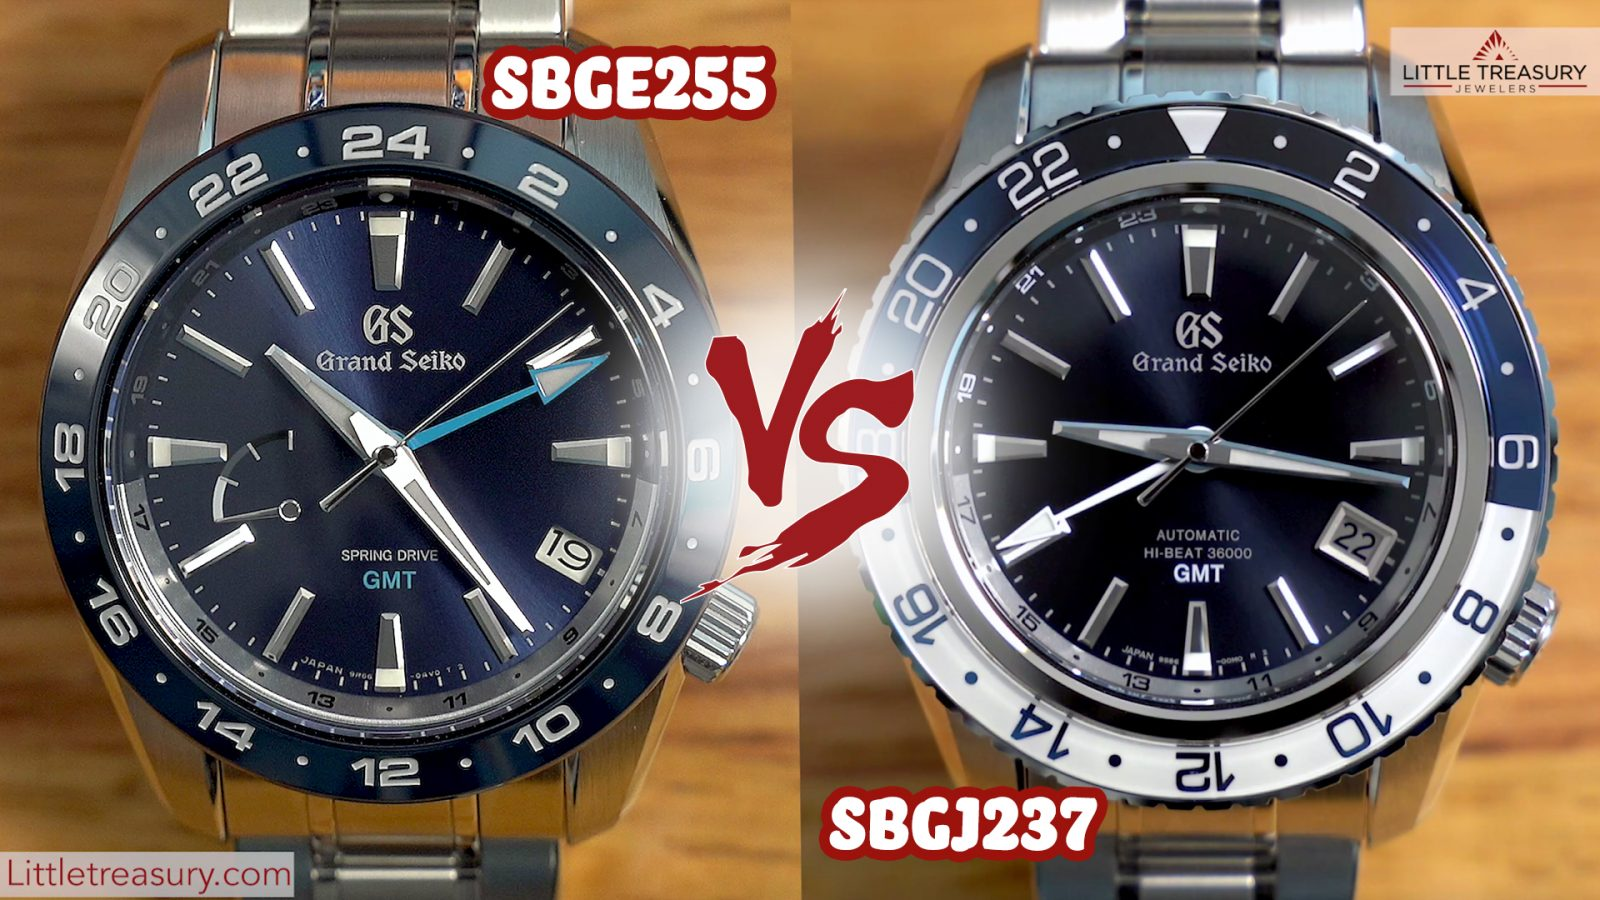 Grand Seiko SBGE255 vs SBGJ237